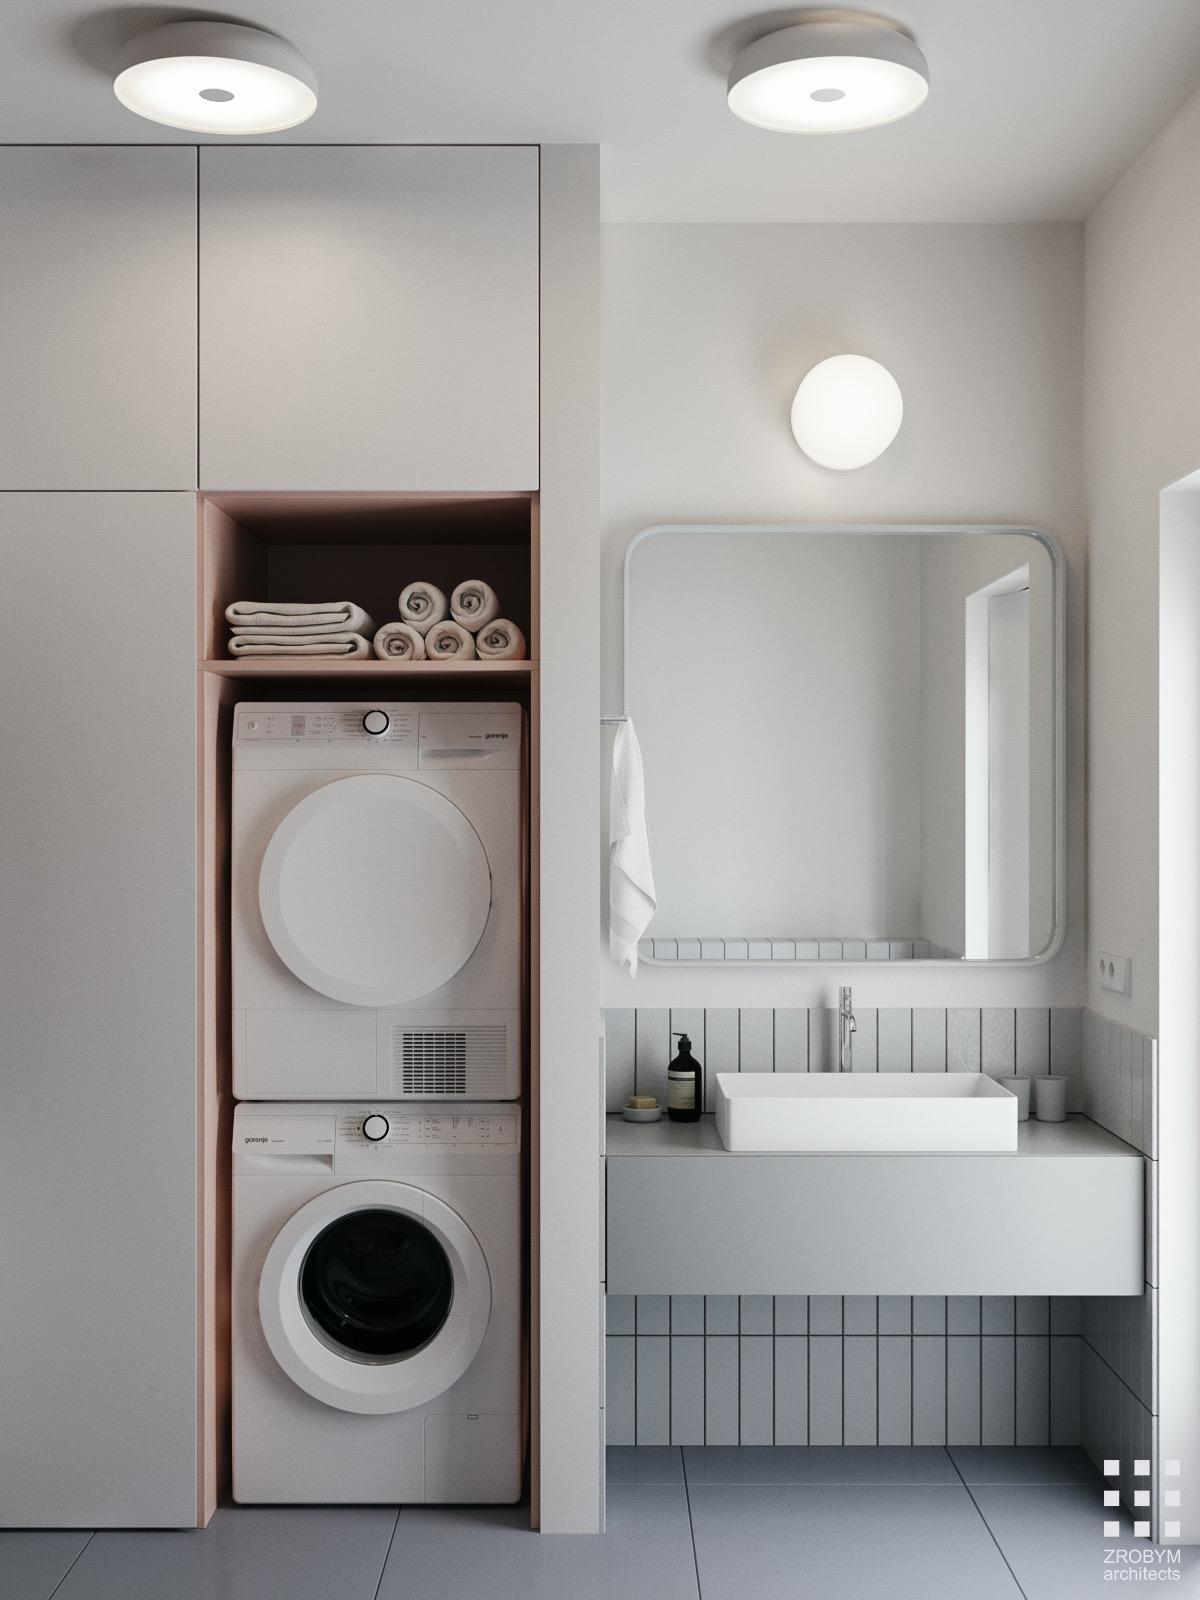 bathroom-tile-ideas-grey-and-white